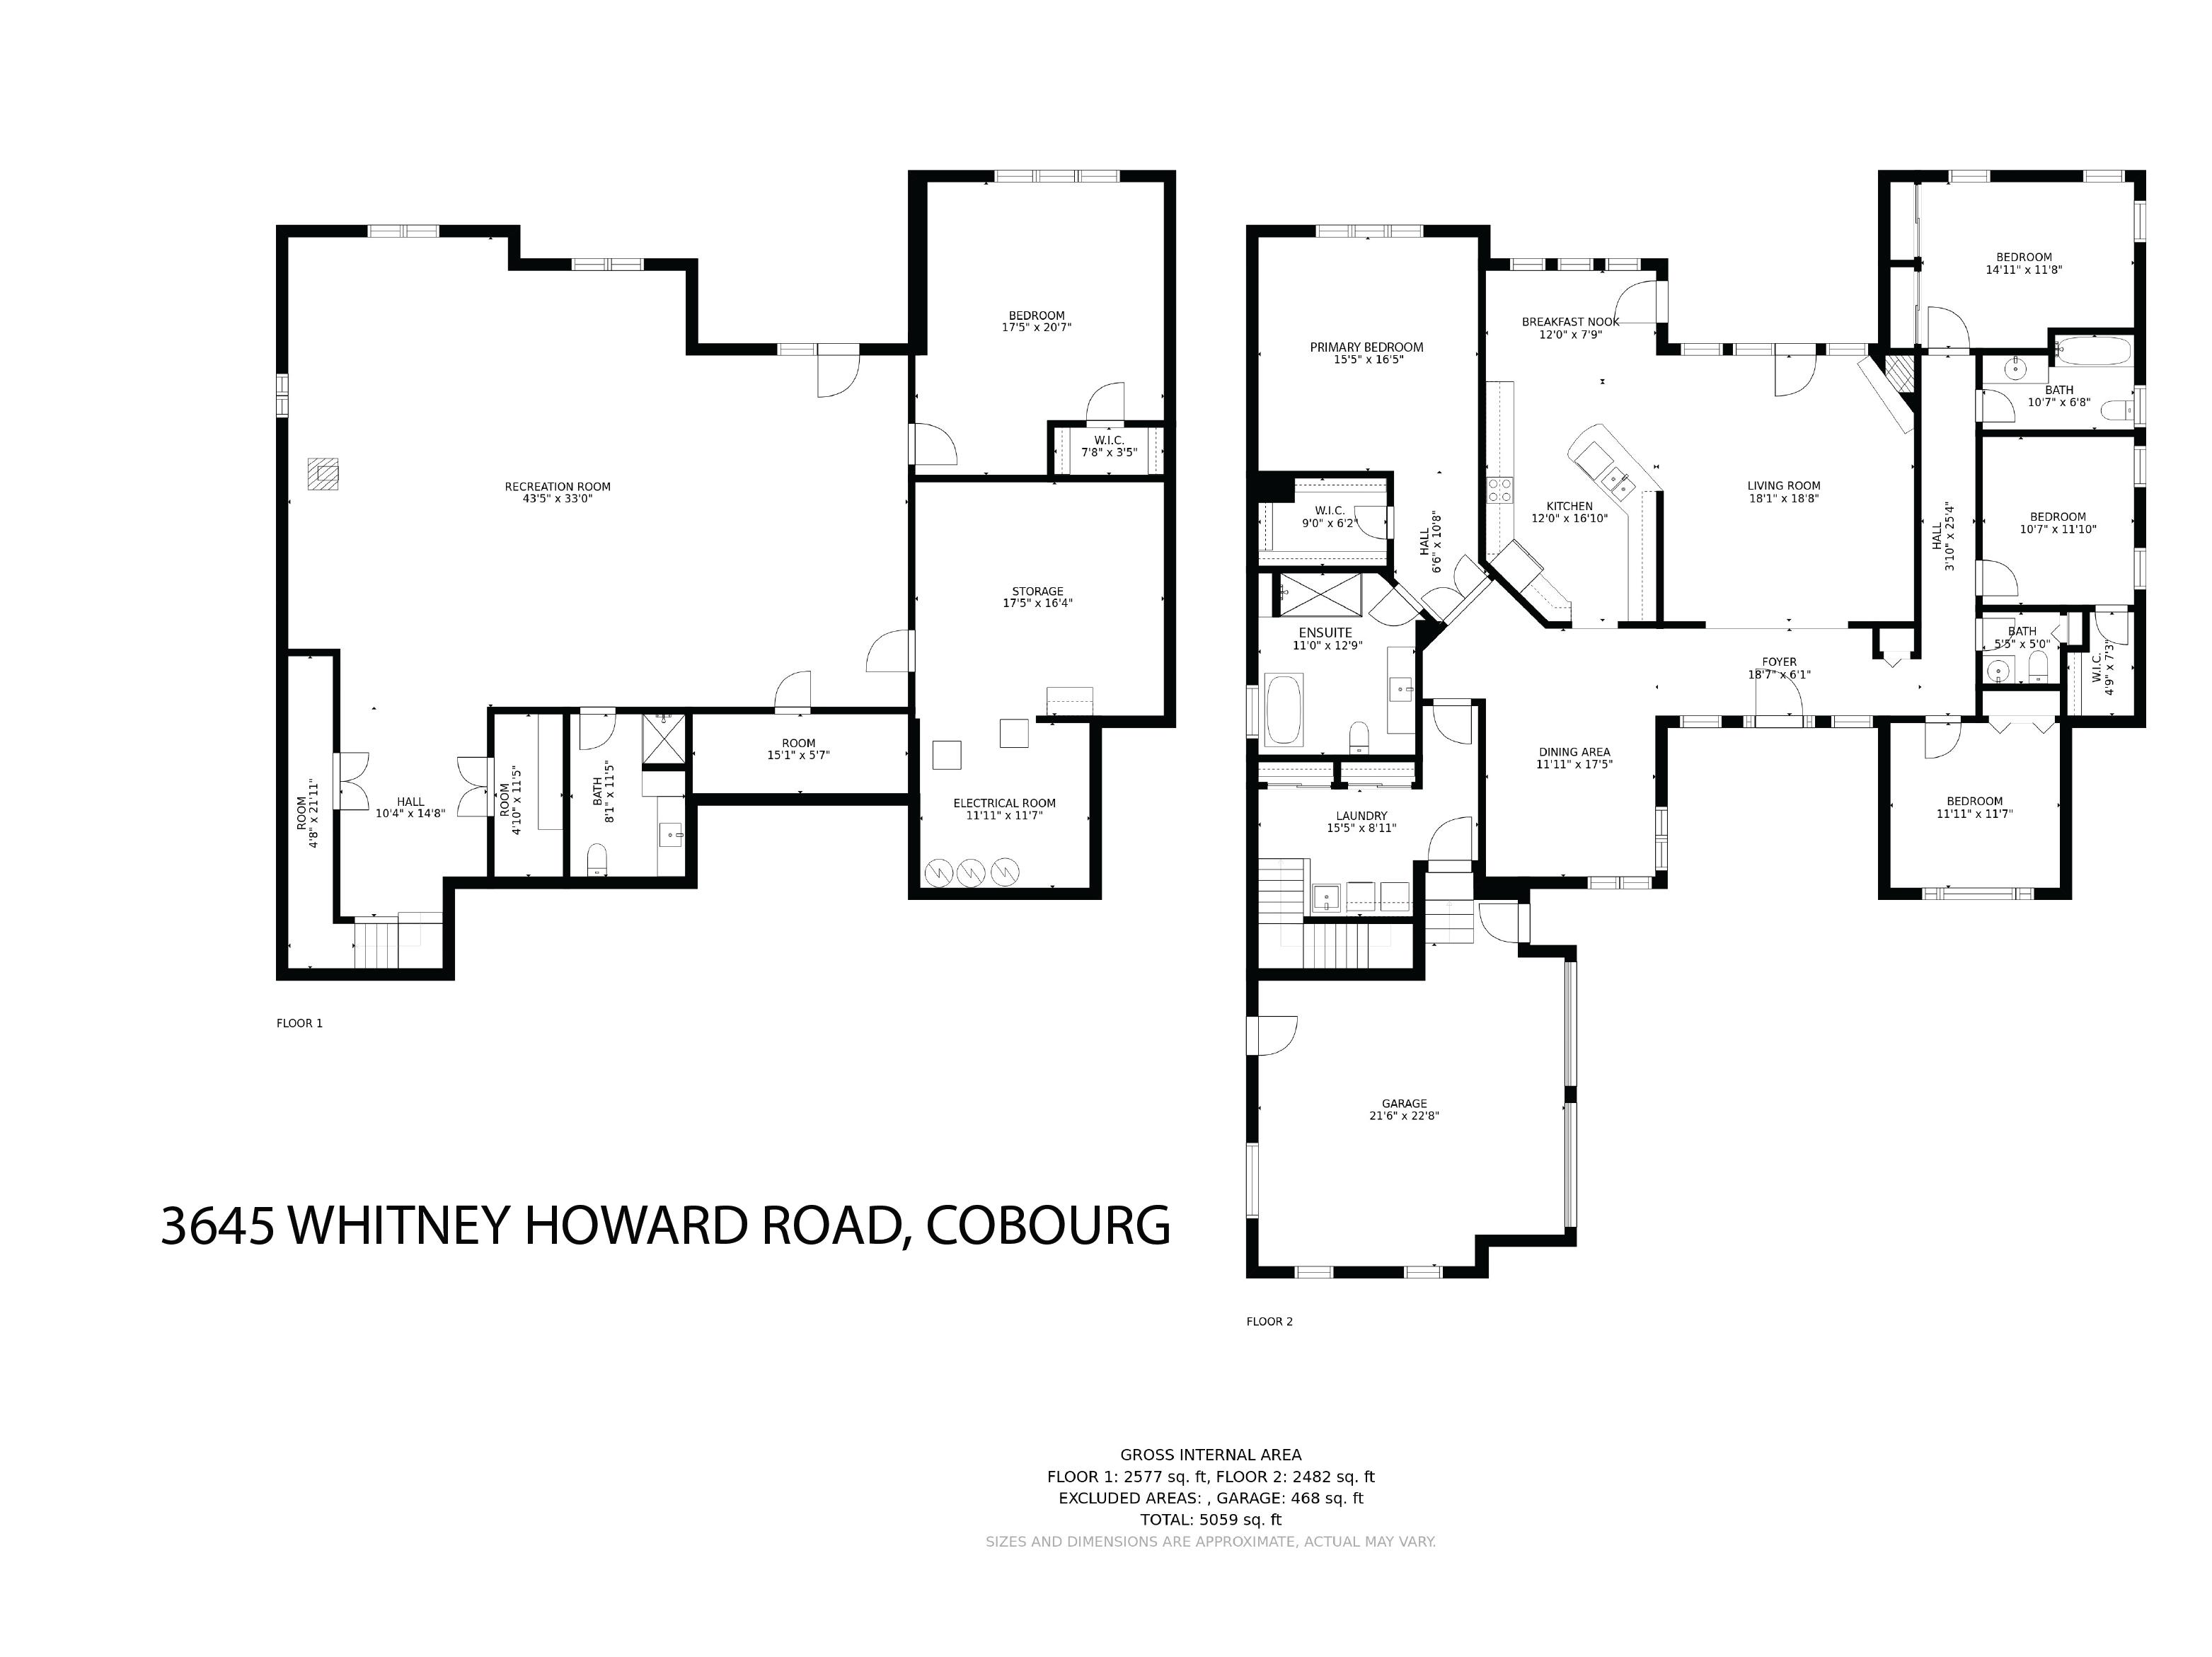 3645 Whitney Howard Road floorplan